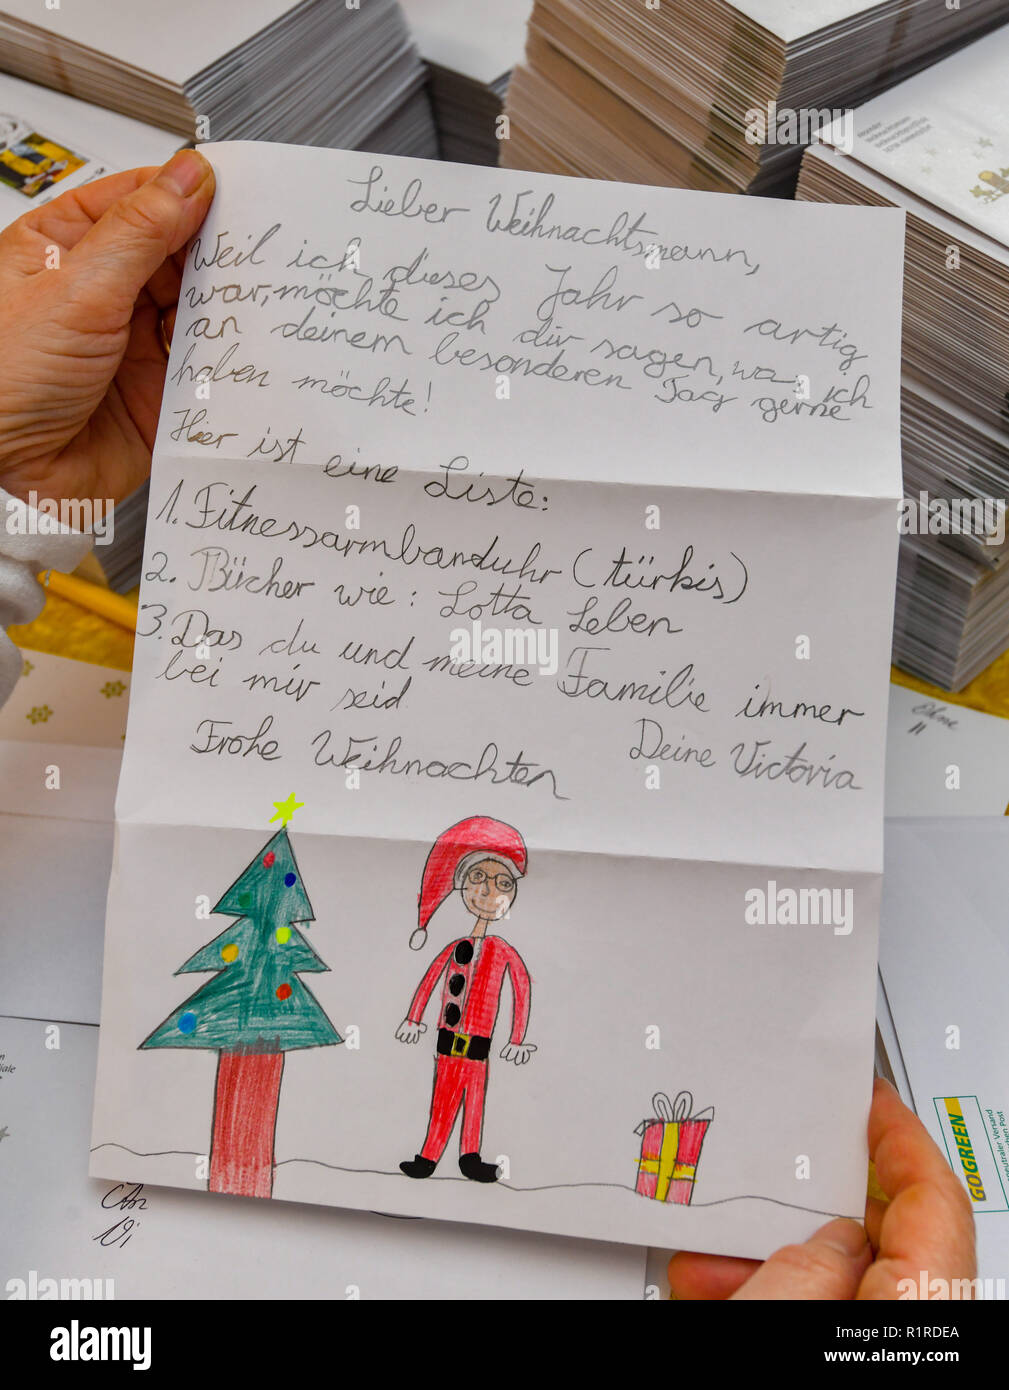 Himmelpfort, Germany  14th Nov, 2018  A Deutsche Post